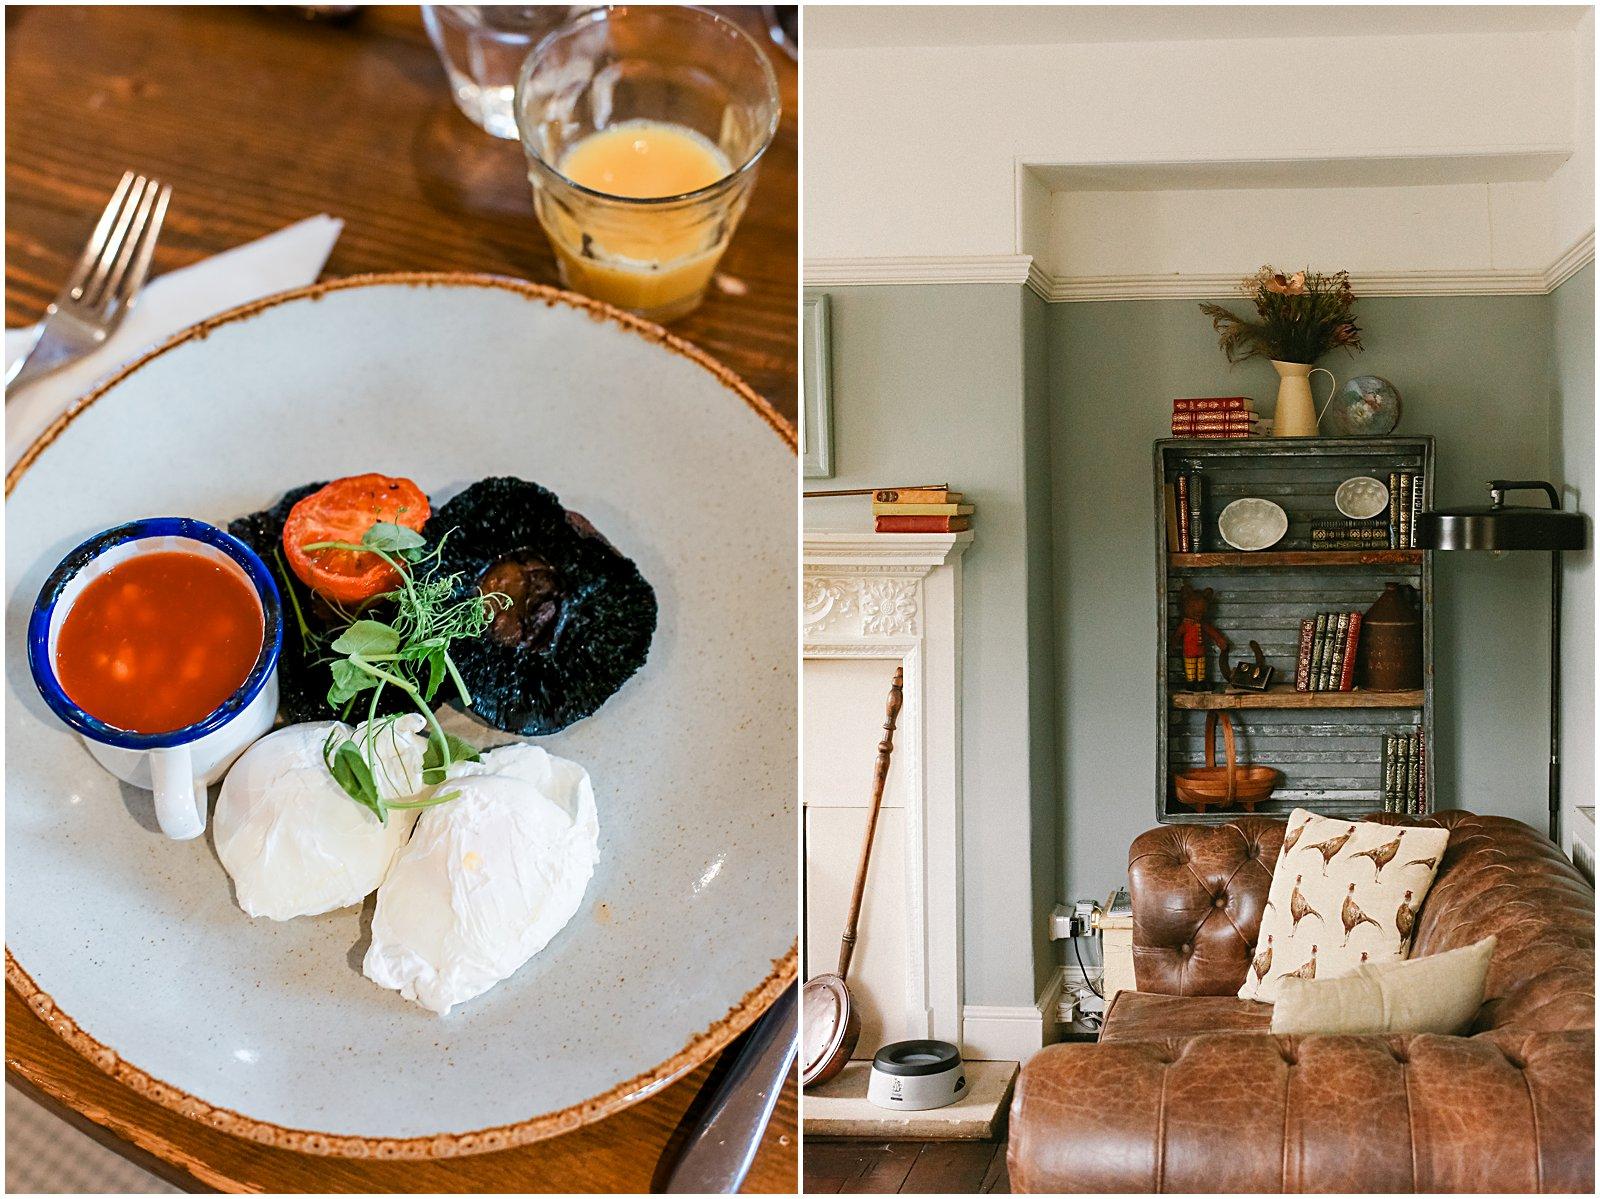 breakfast at Widbrook Grange Hotel in Wiltshire